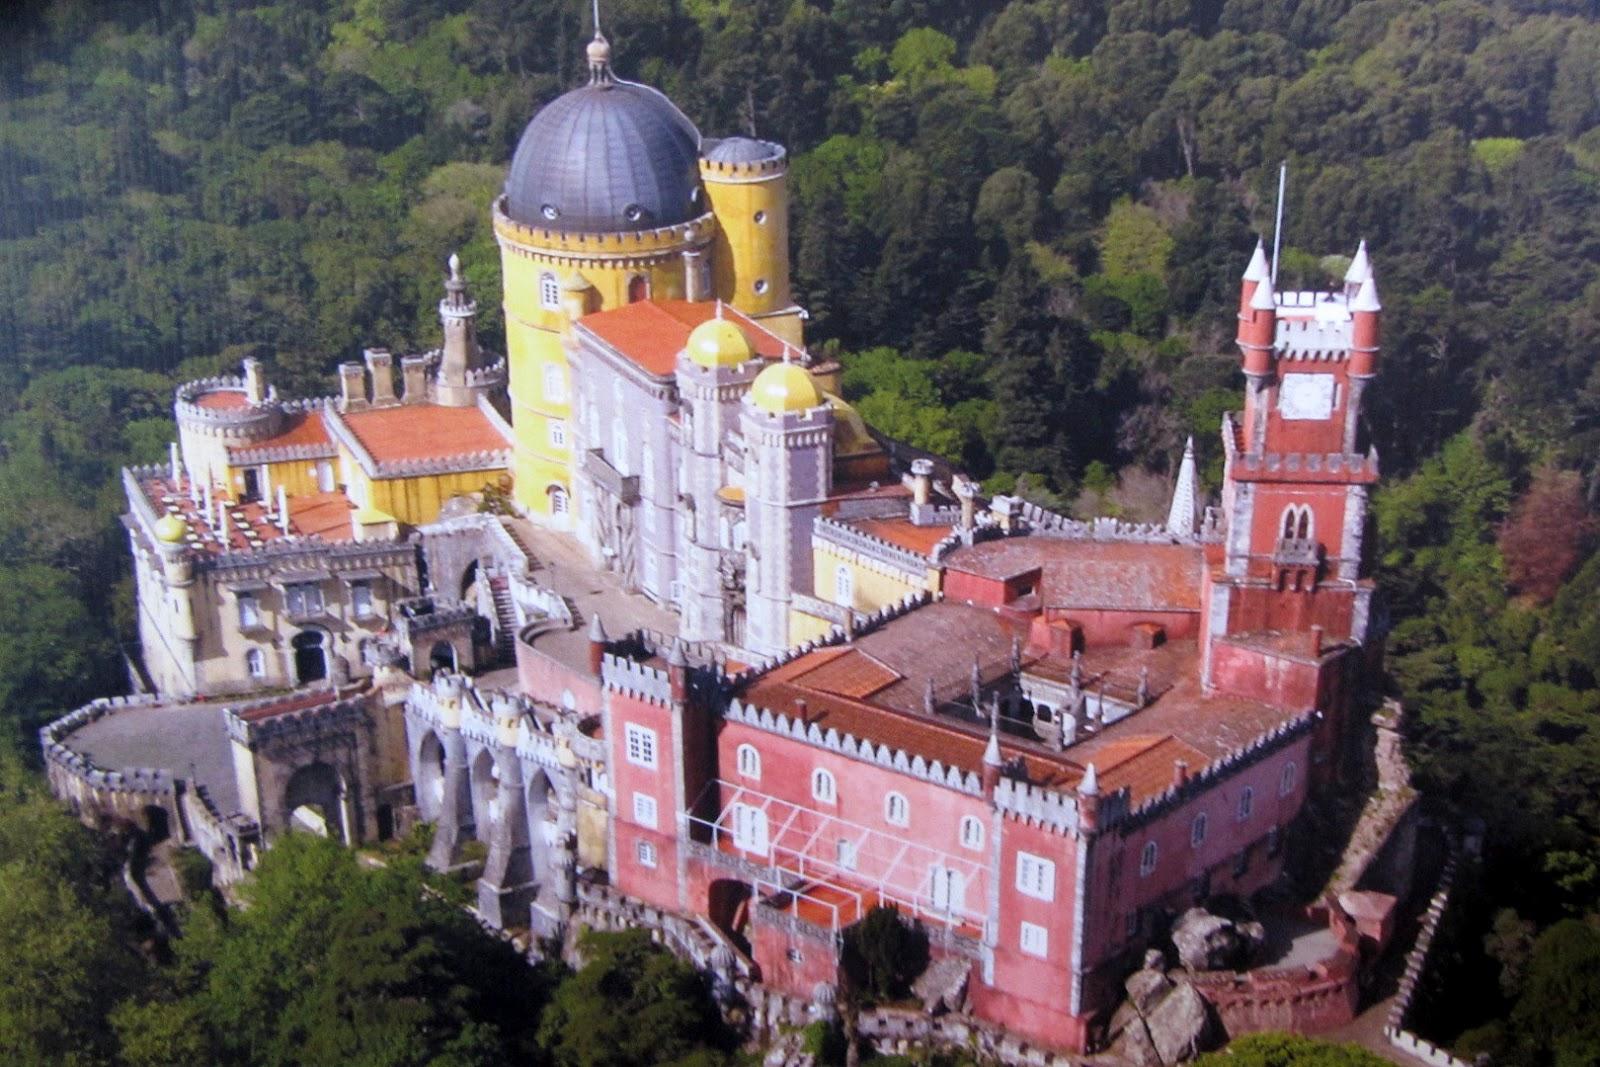 Vedere de sus asupra Palácio Nacional da Pena